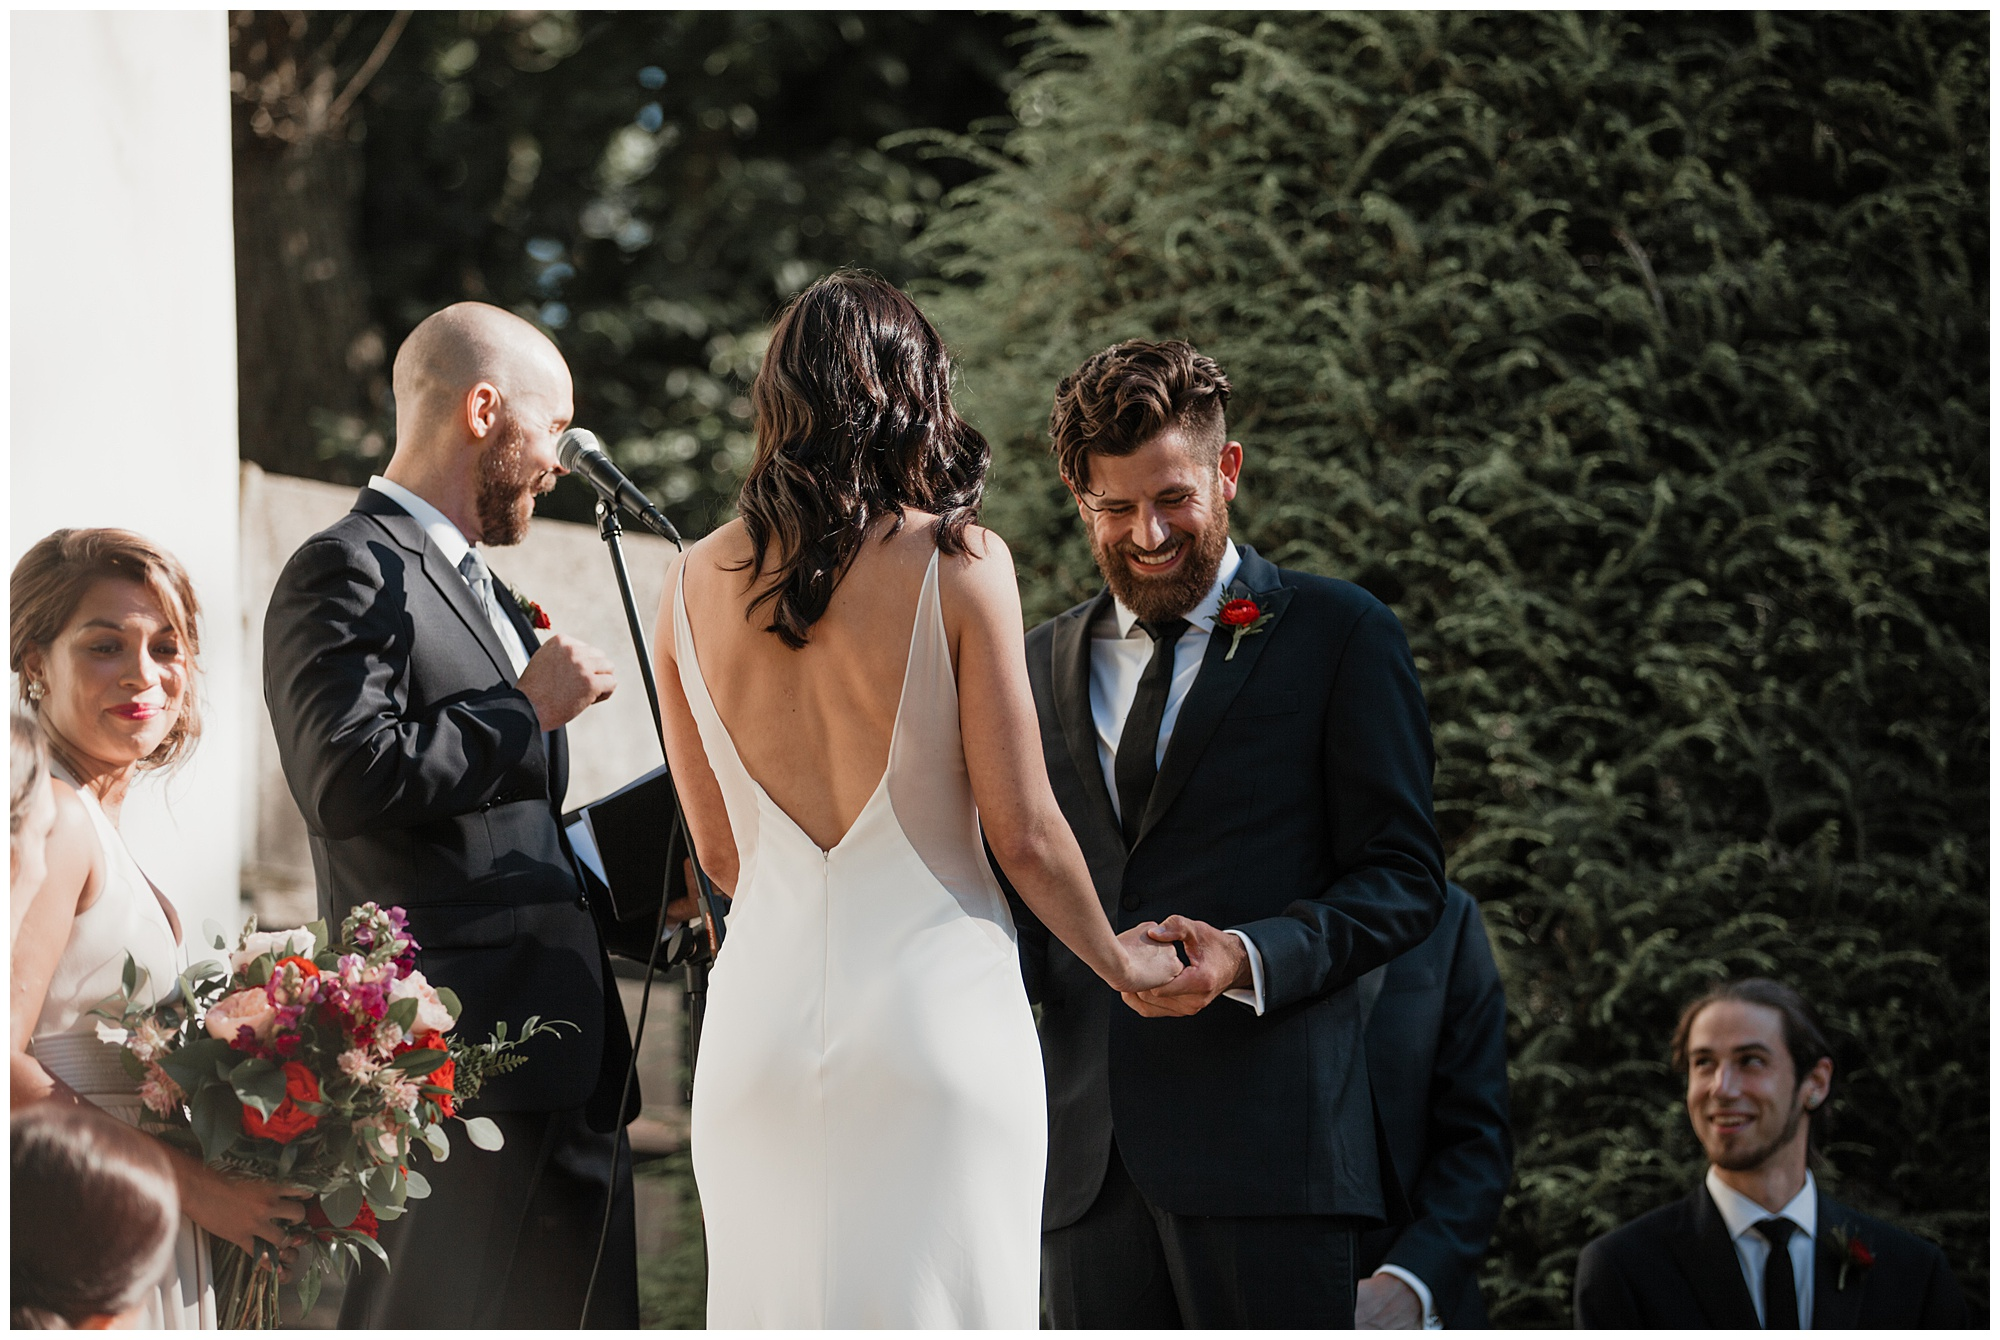 allerton_park_wedding_champaign_il_chicago_wright_photographs_ne_0087.jpg